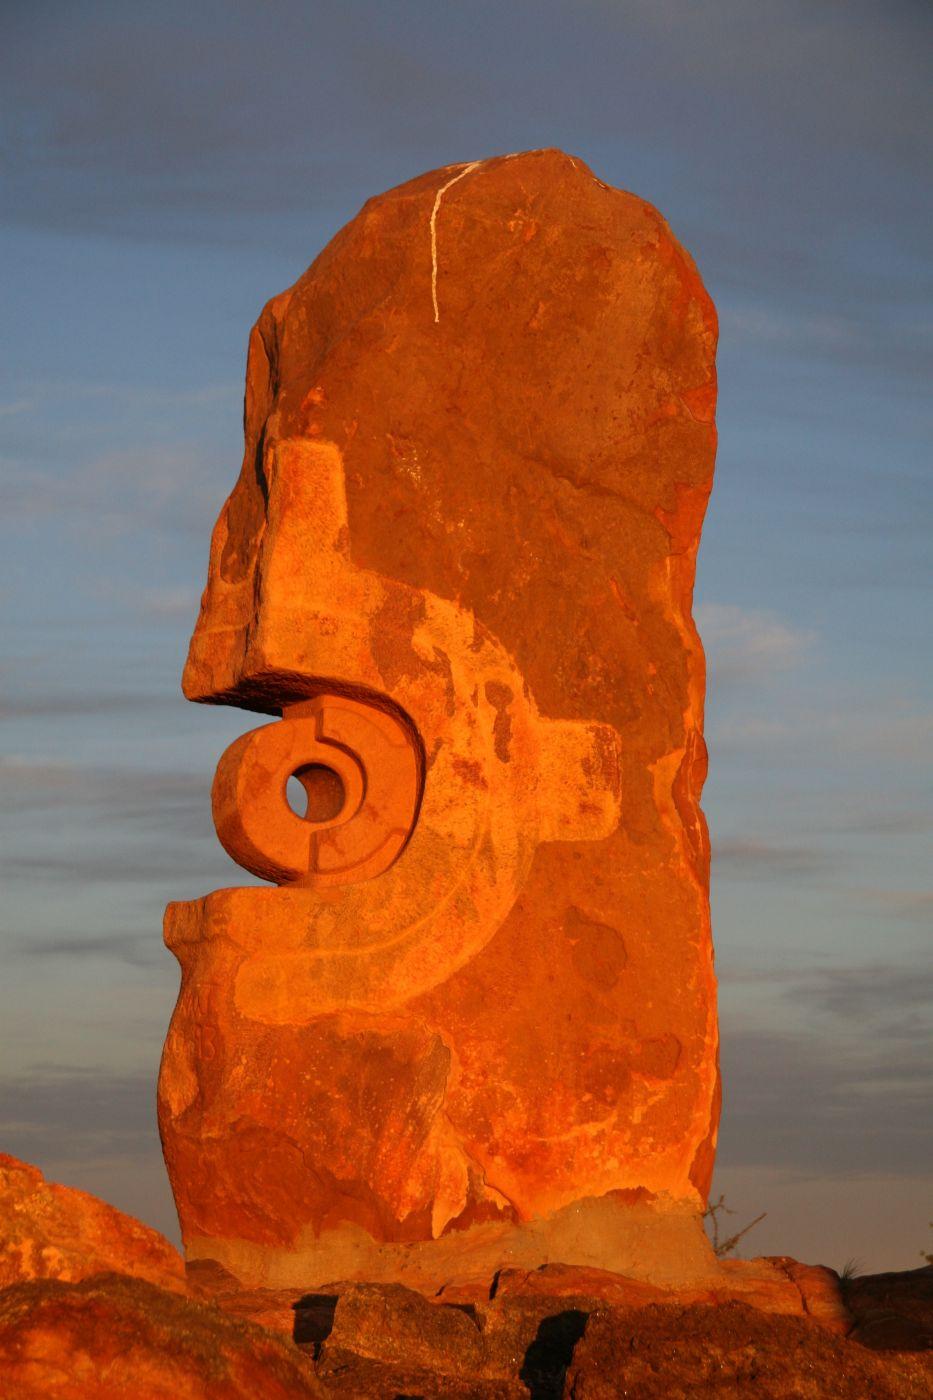 The Living Desert and Sculptures, Australia